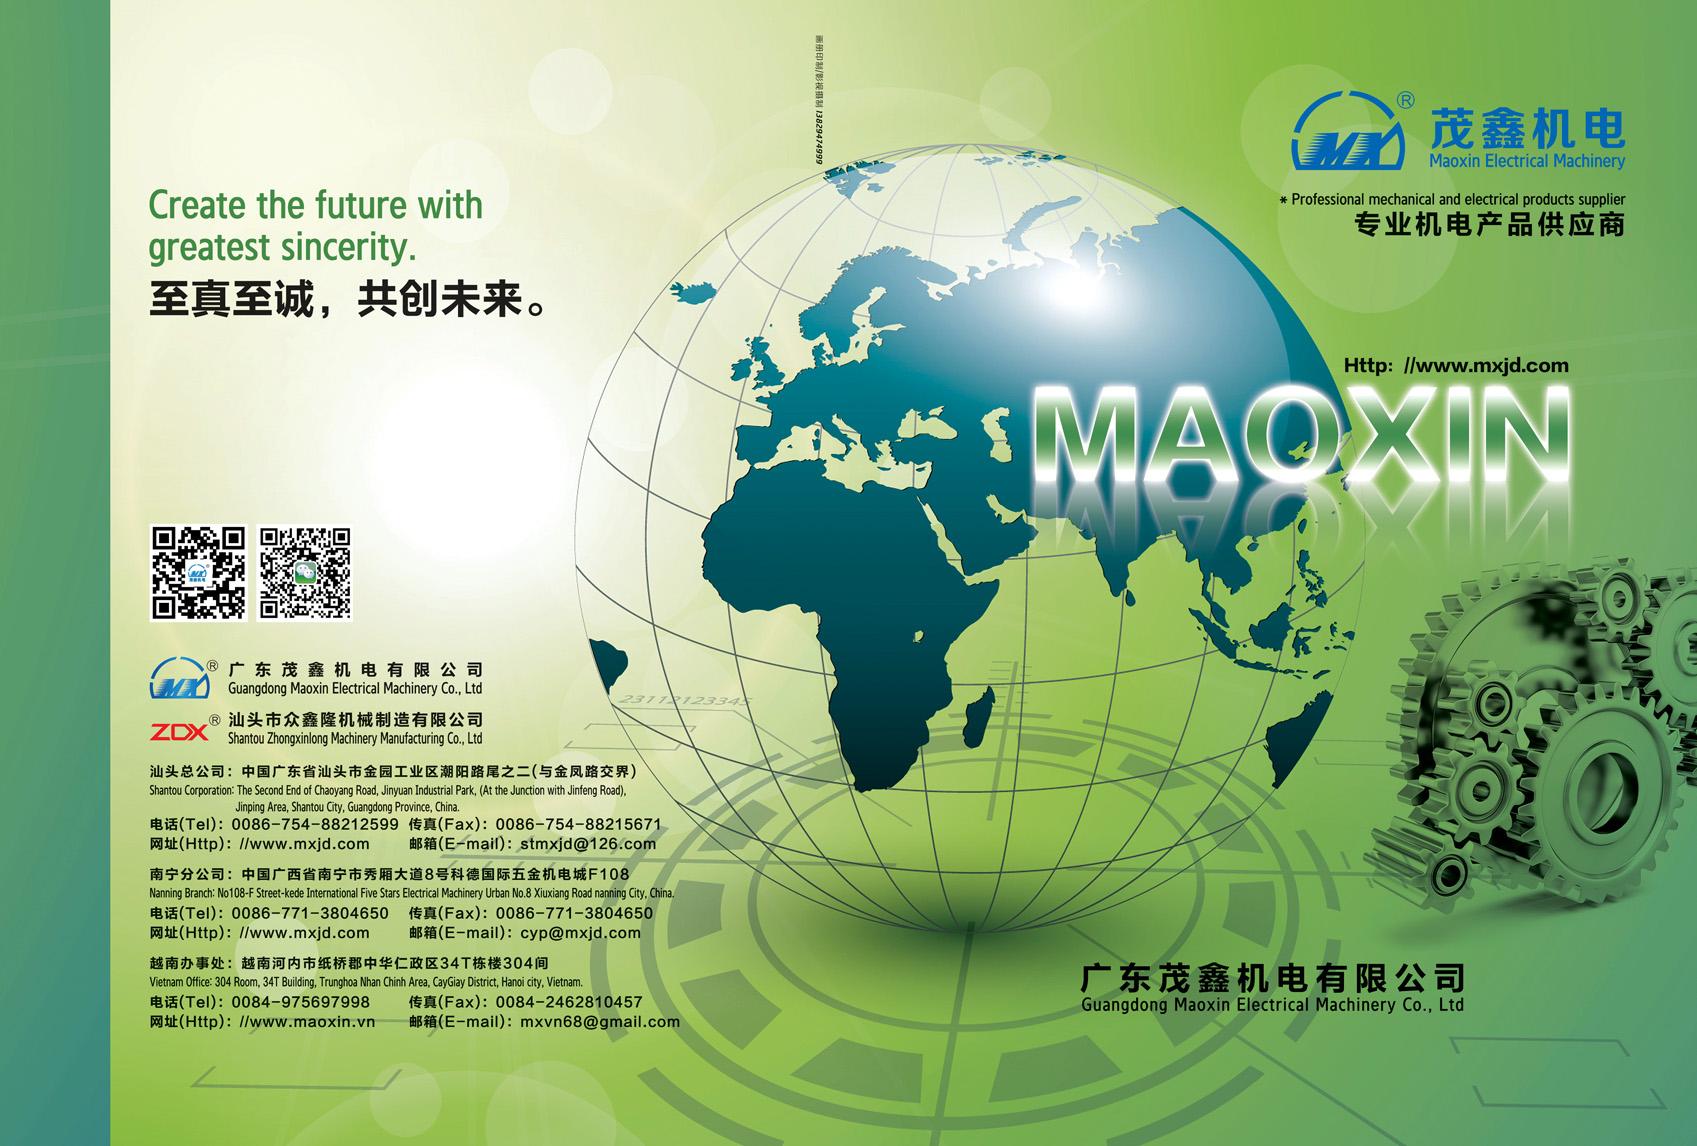 Guangdong Maoxin Electrical Machinery Co.,Ltd Main Image